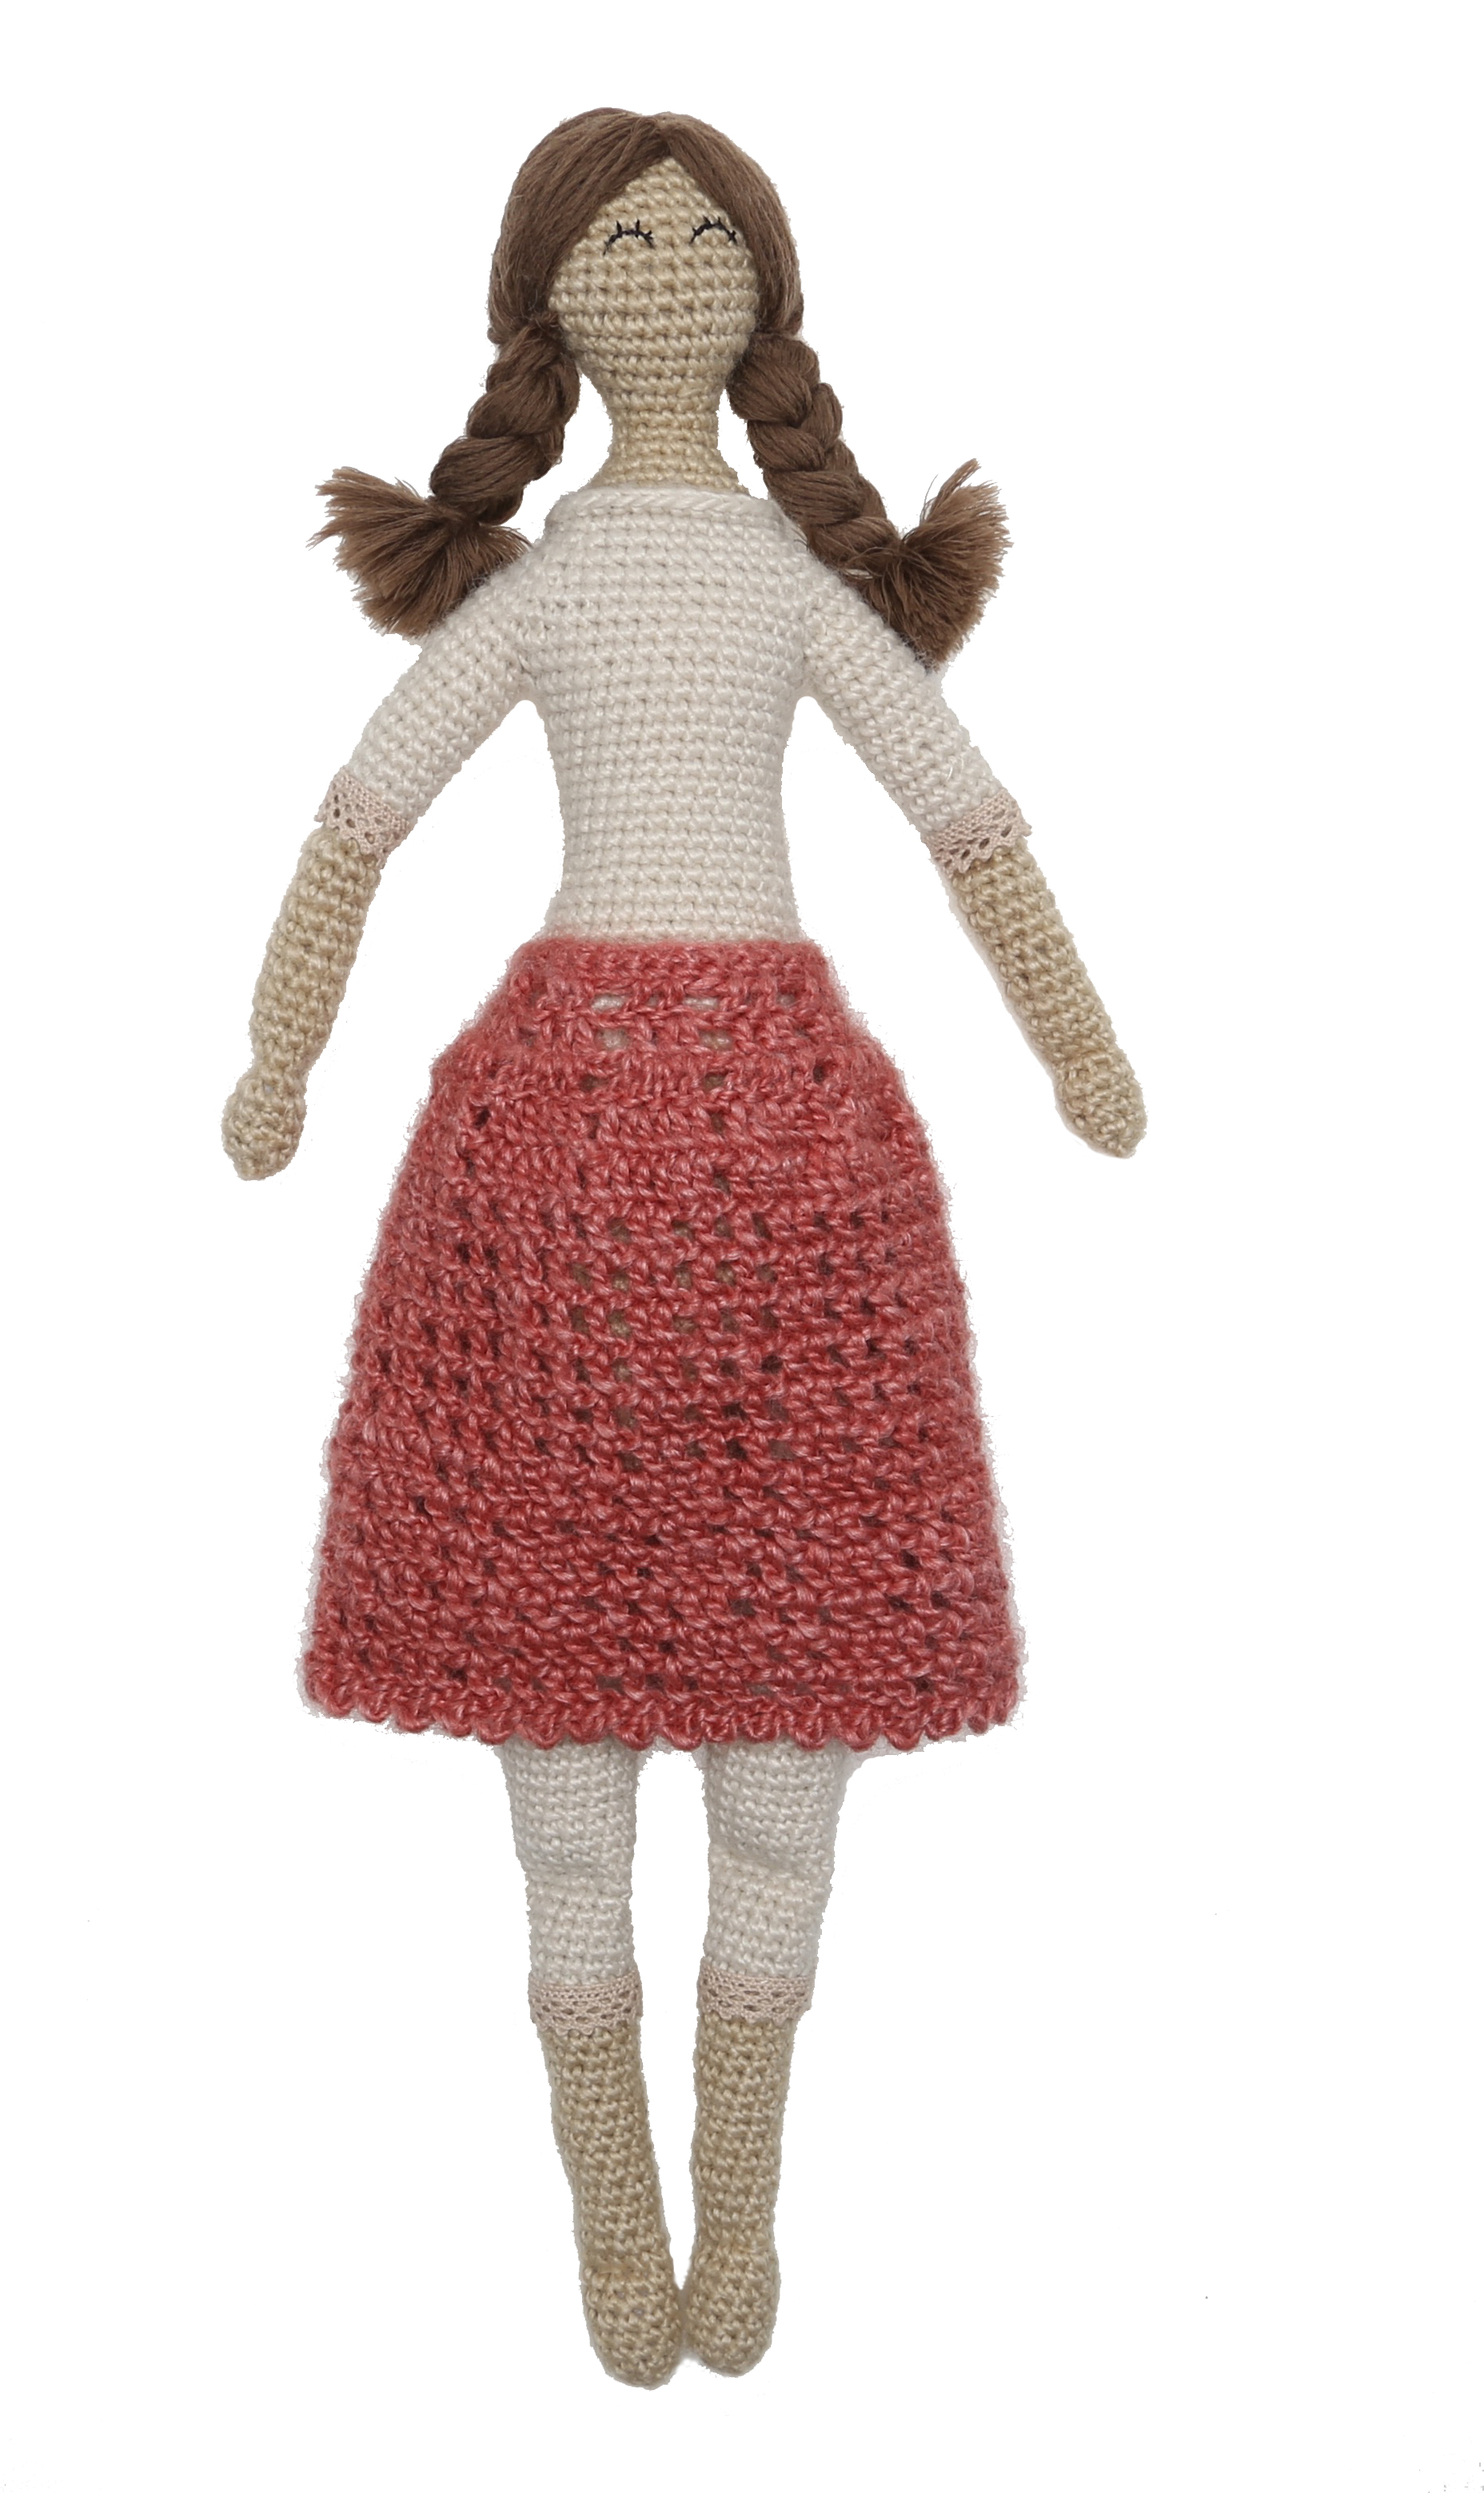 Jofrid Amp Runa Crochet For Payment Go Handmade